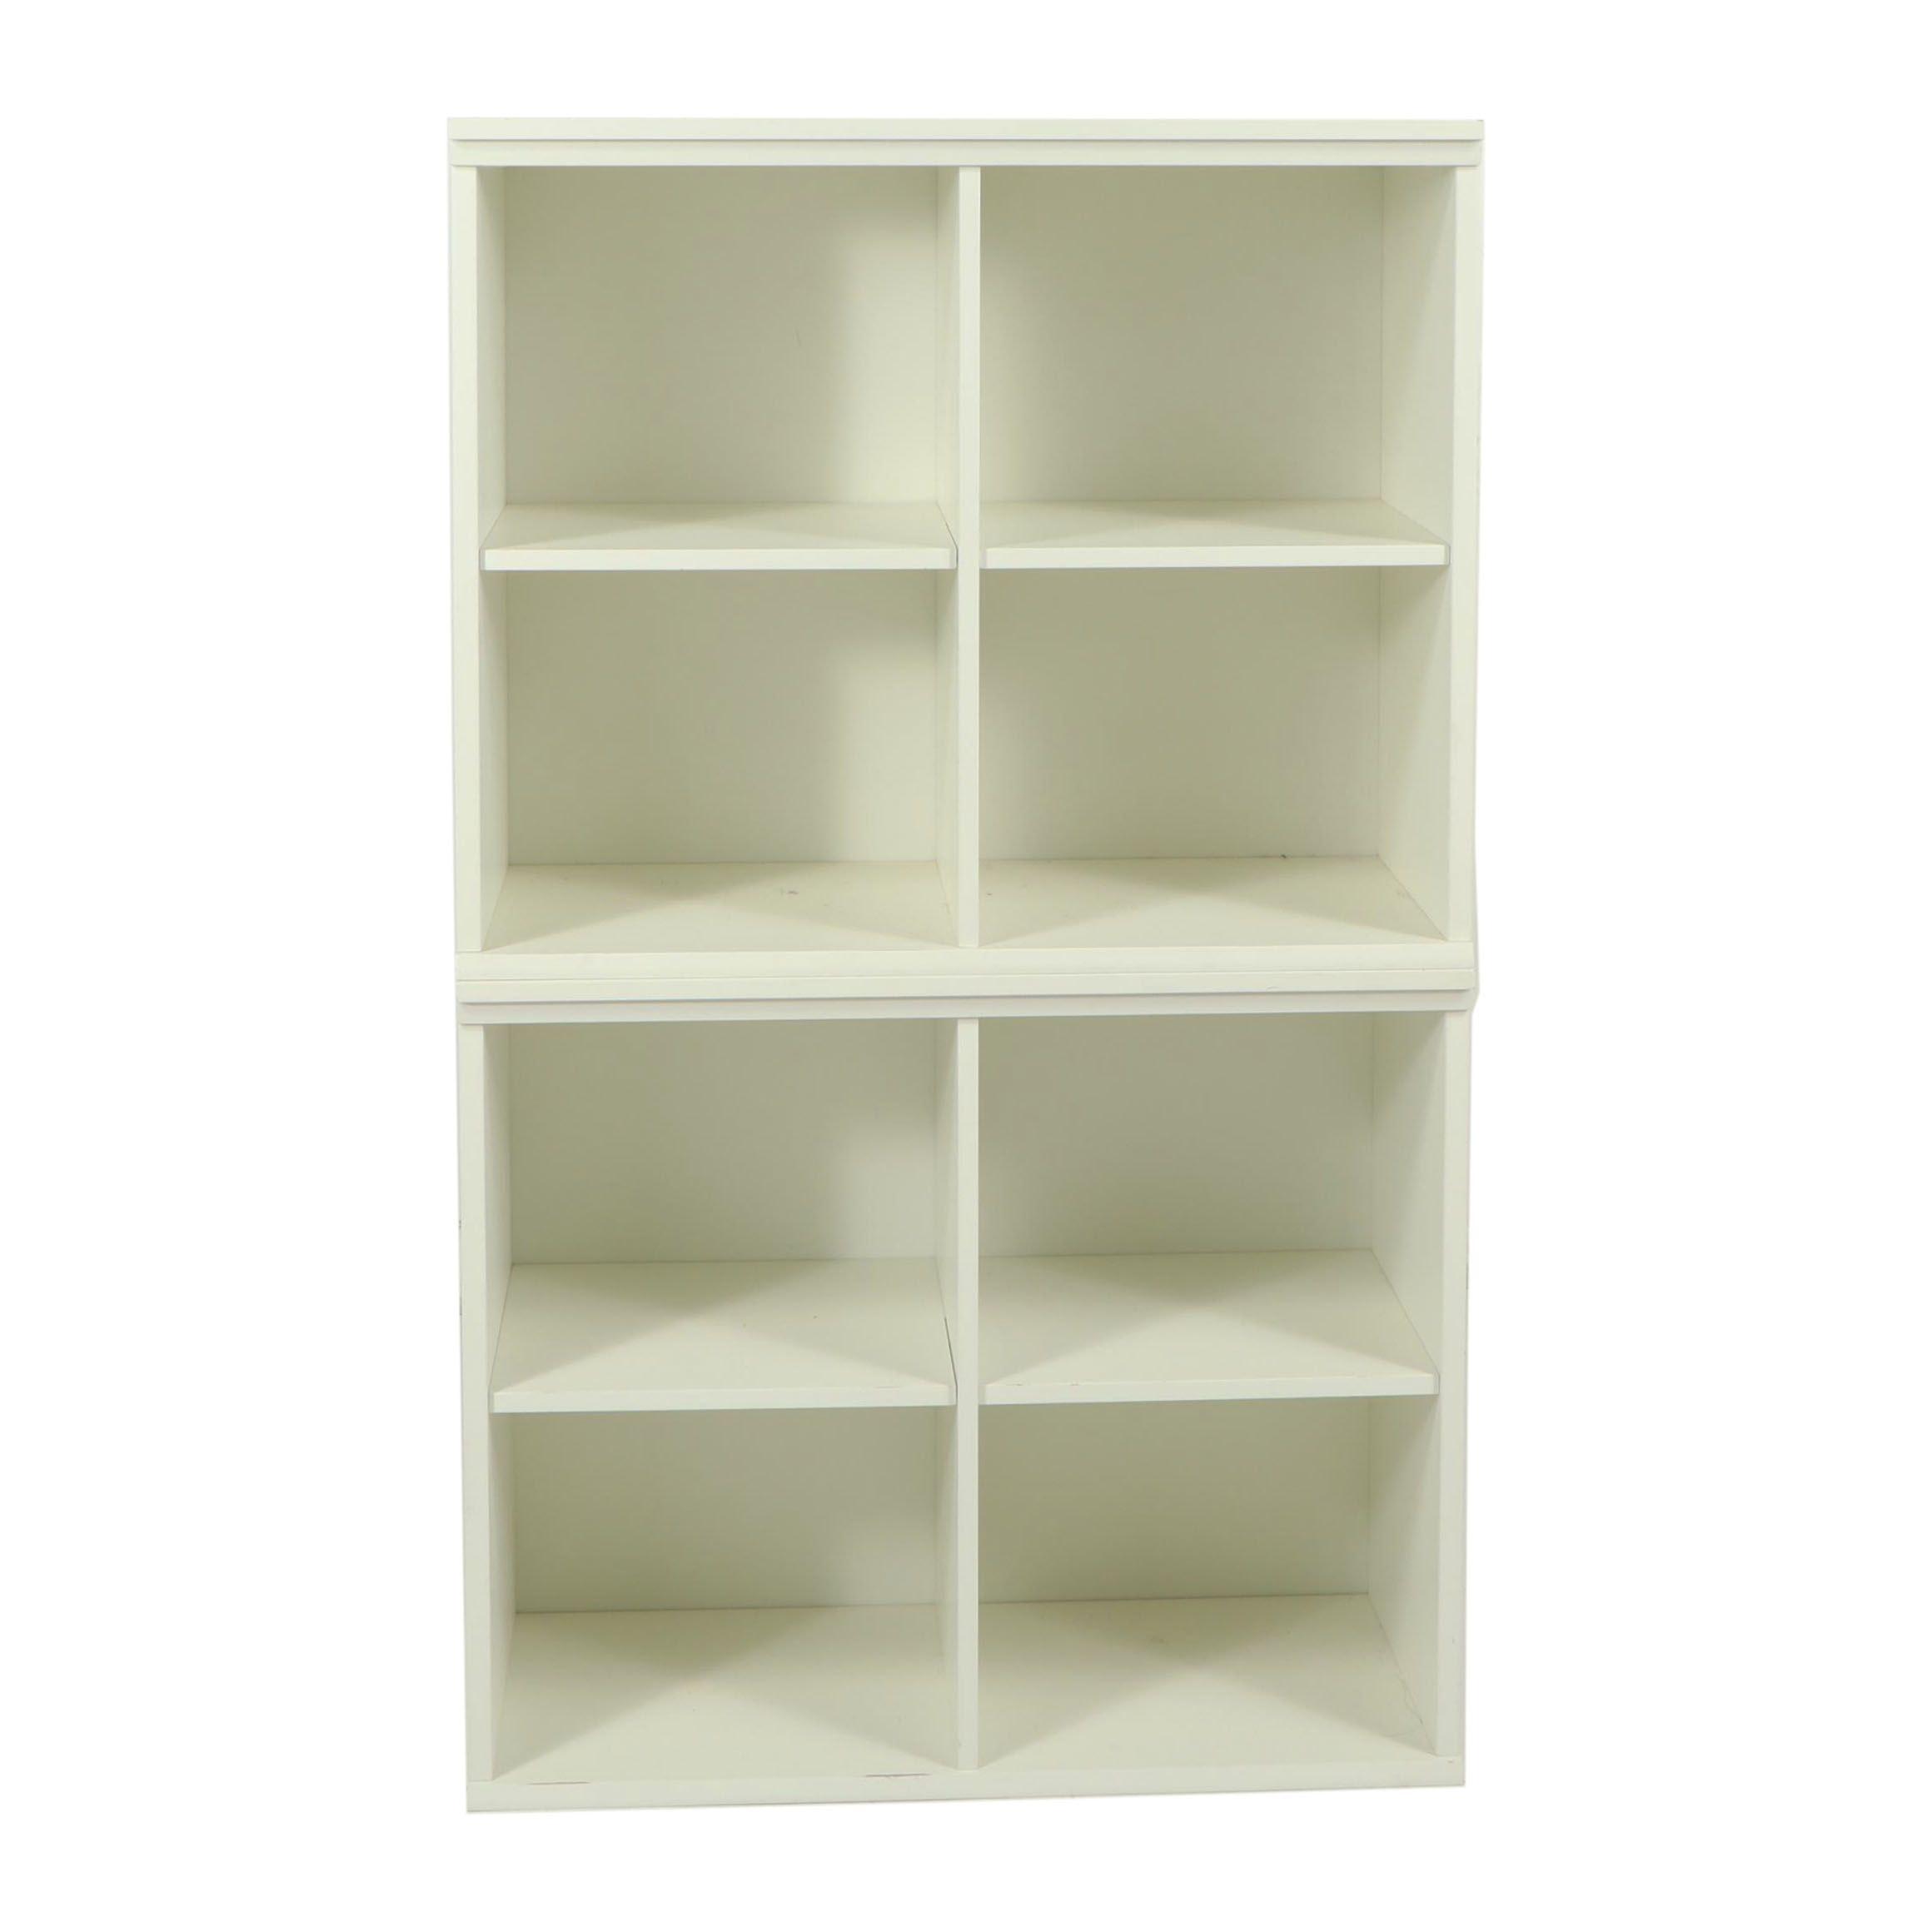 Painted Cubby Shelf Storage Units, 21st Century